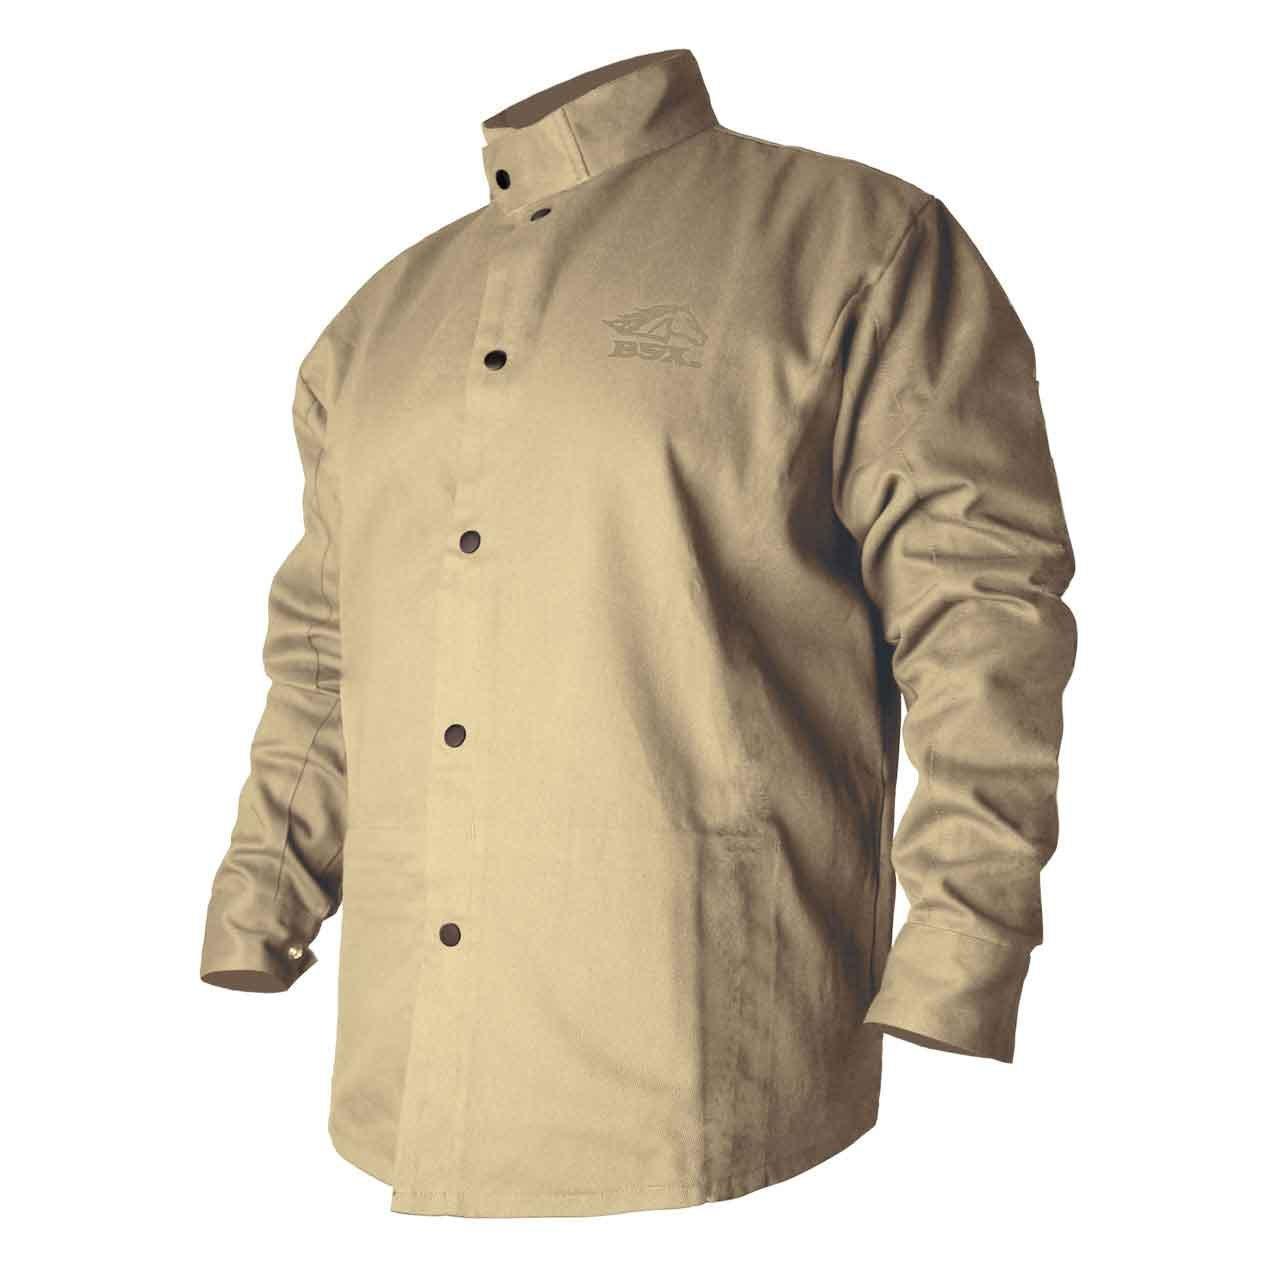 BSX Flame-Resistant Welding Jacket - Welder's Khaki, Size Small